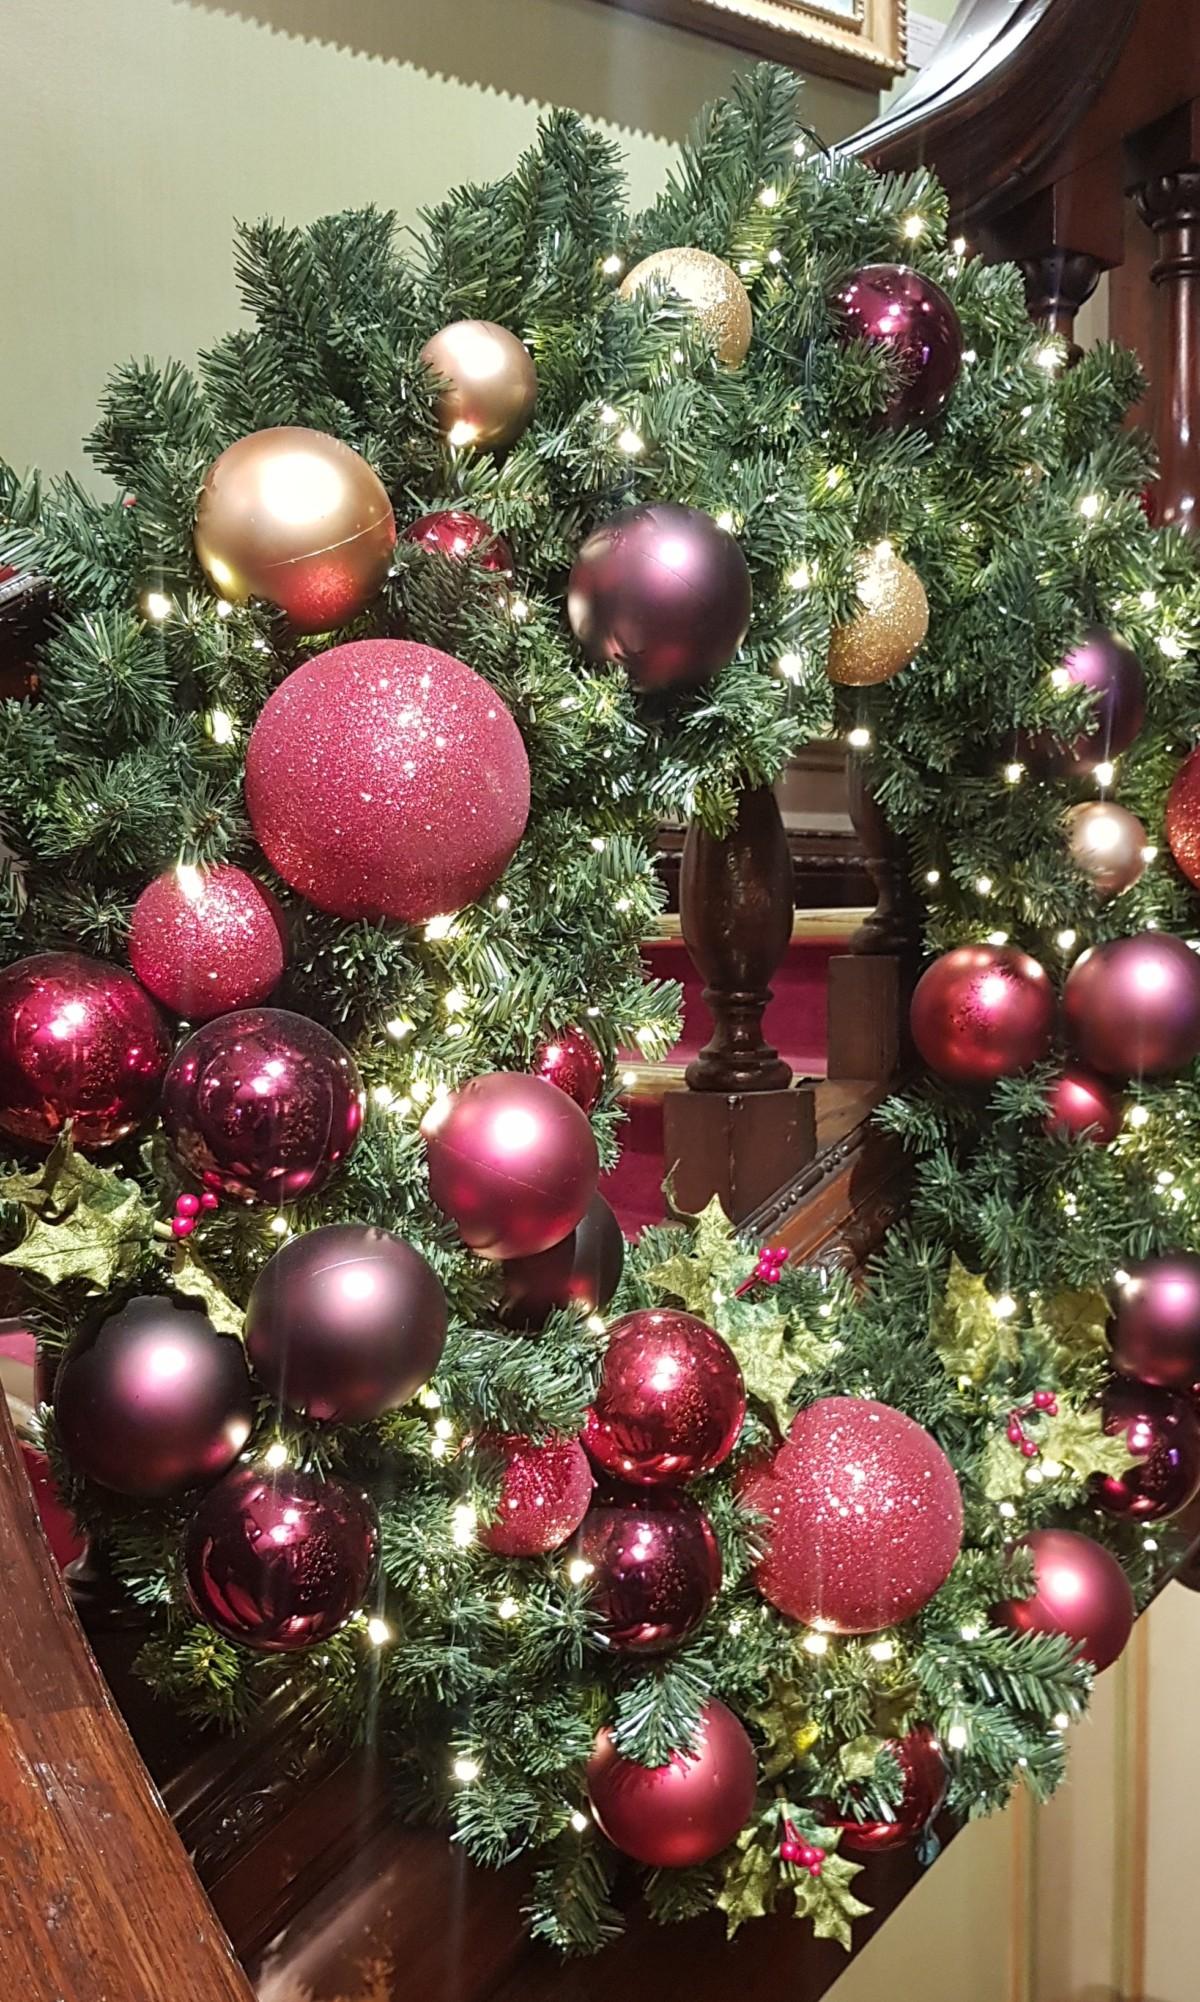 BLOGMAS Day 9 | Pinterest - BLOGMAS Board, Blogmas, Christmas, festive, festive spirit, Festivities, Christmas Tradition, Pinterest, Pinterest Board. Christmas Wreath, Wreath, Fortnum & Mason, London, Blog A Book Etc, Fay